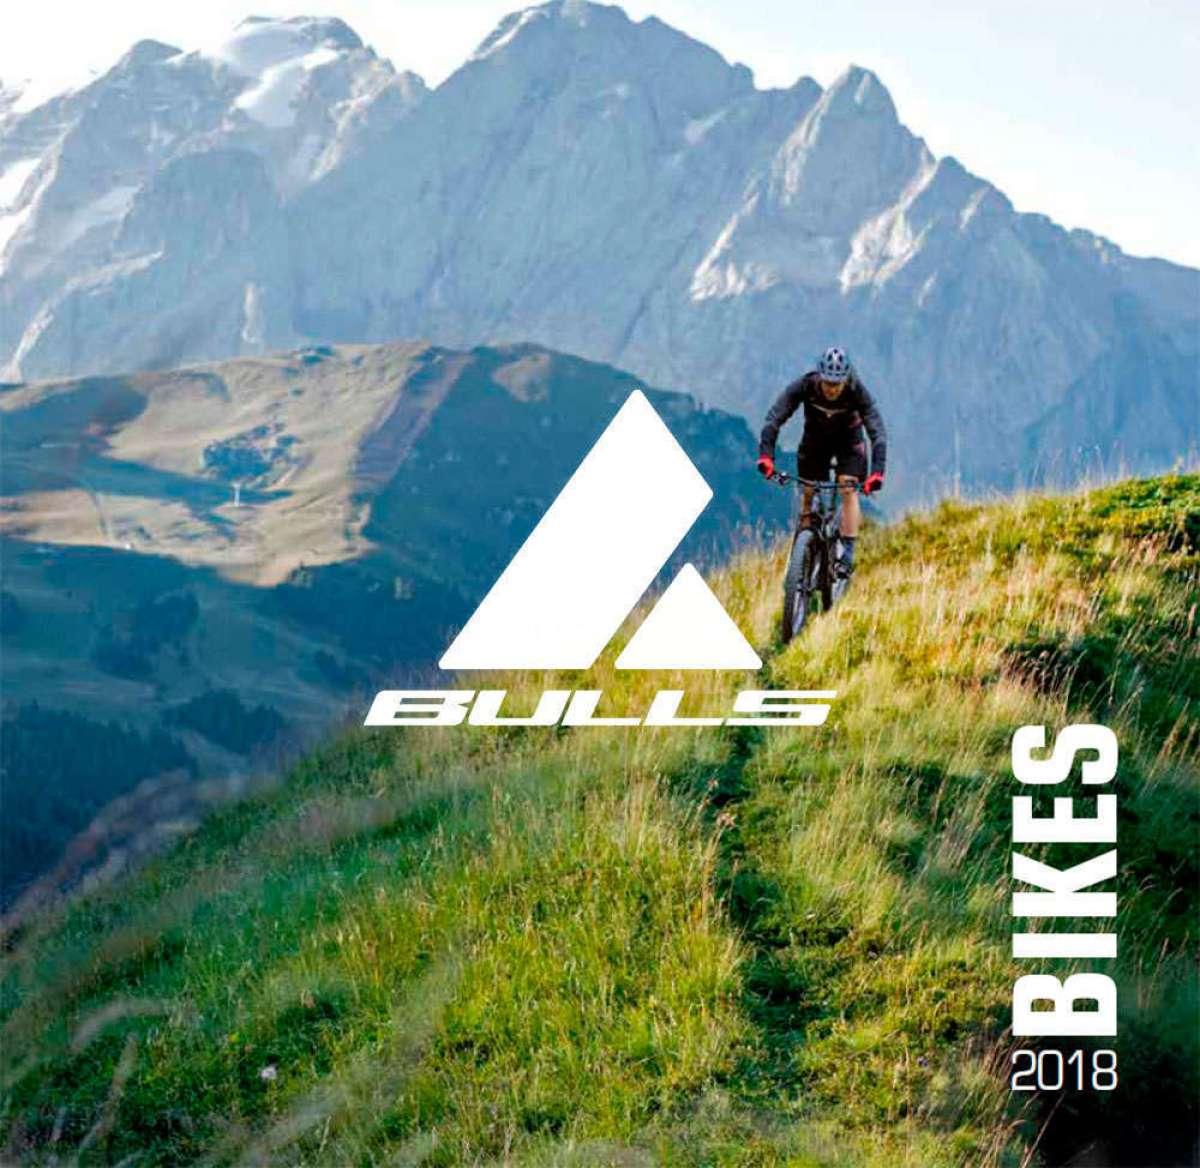 Catálogo de Bulls 2018. Toda la gama de bicicletas Bulls para la temporada 2018